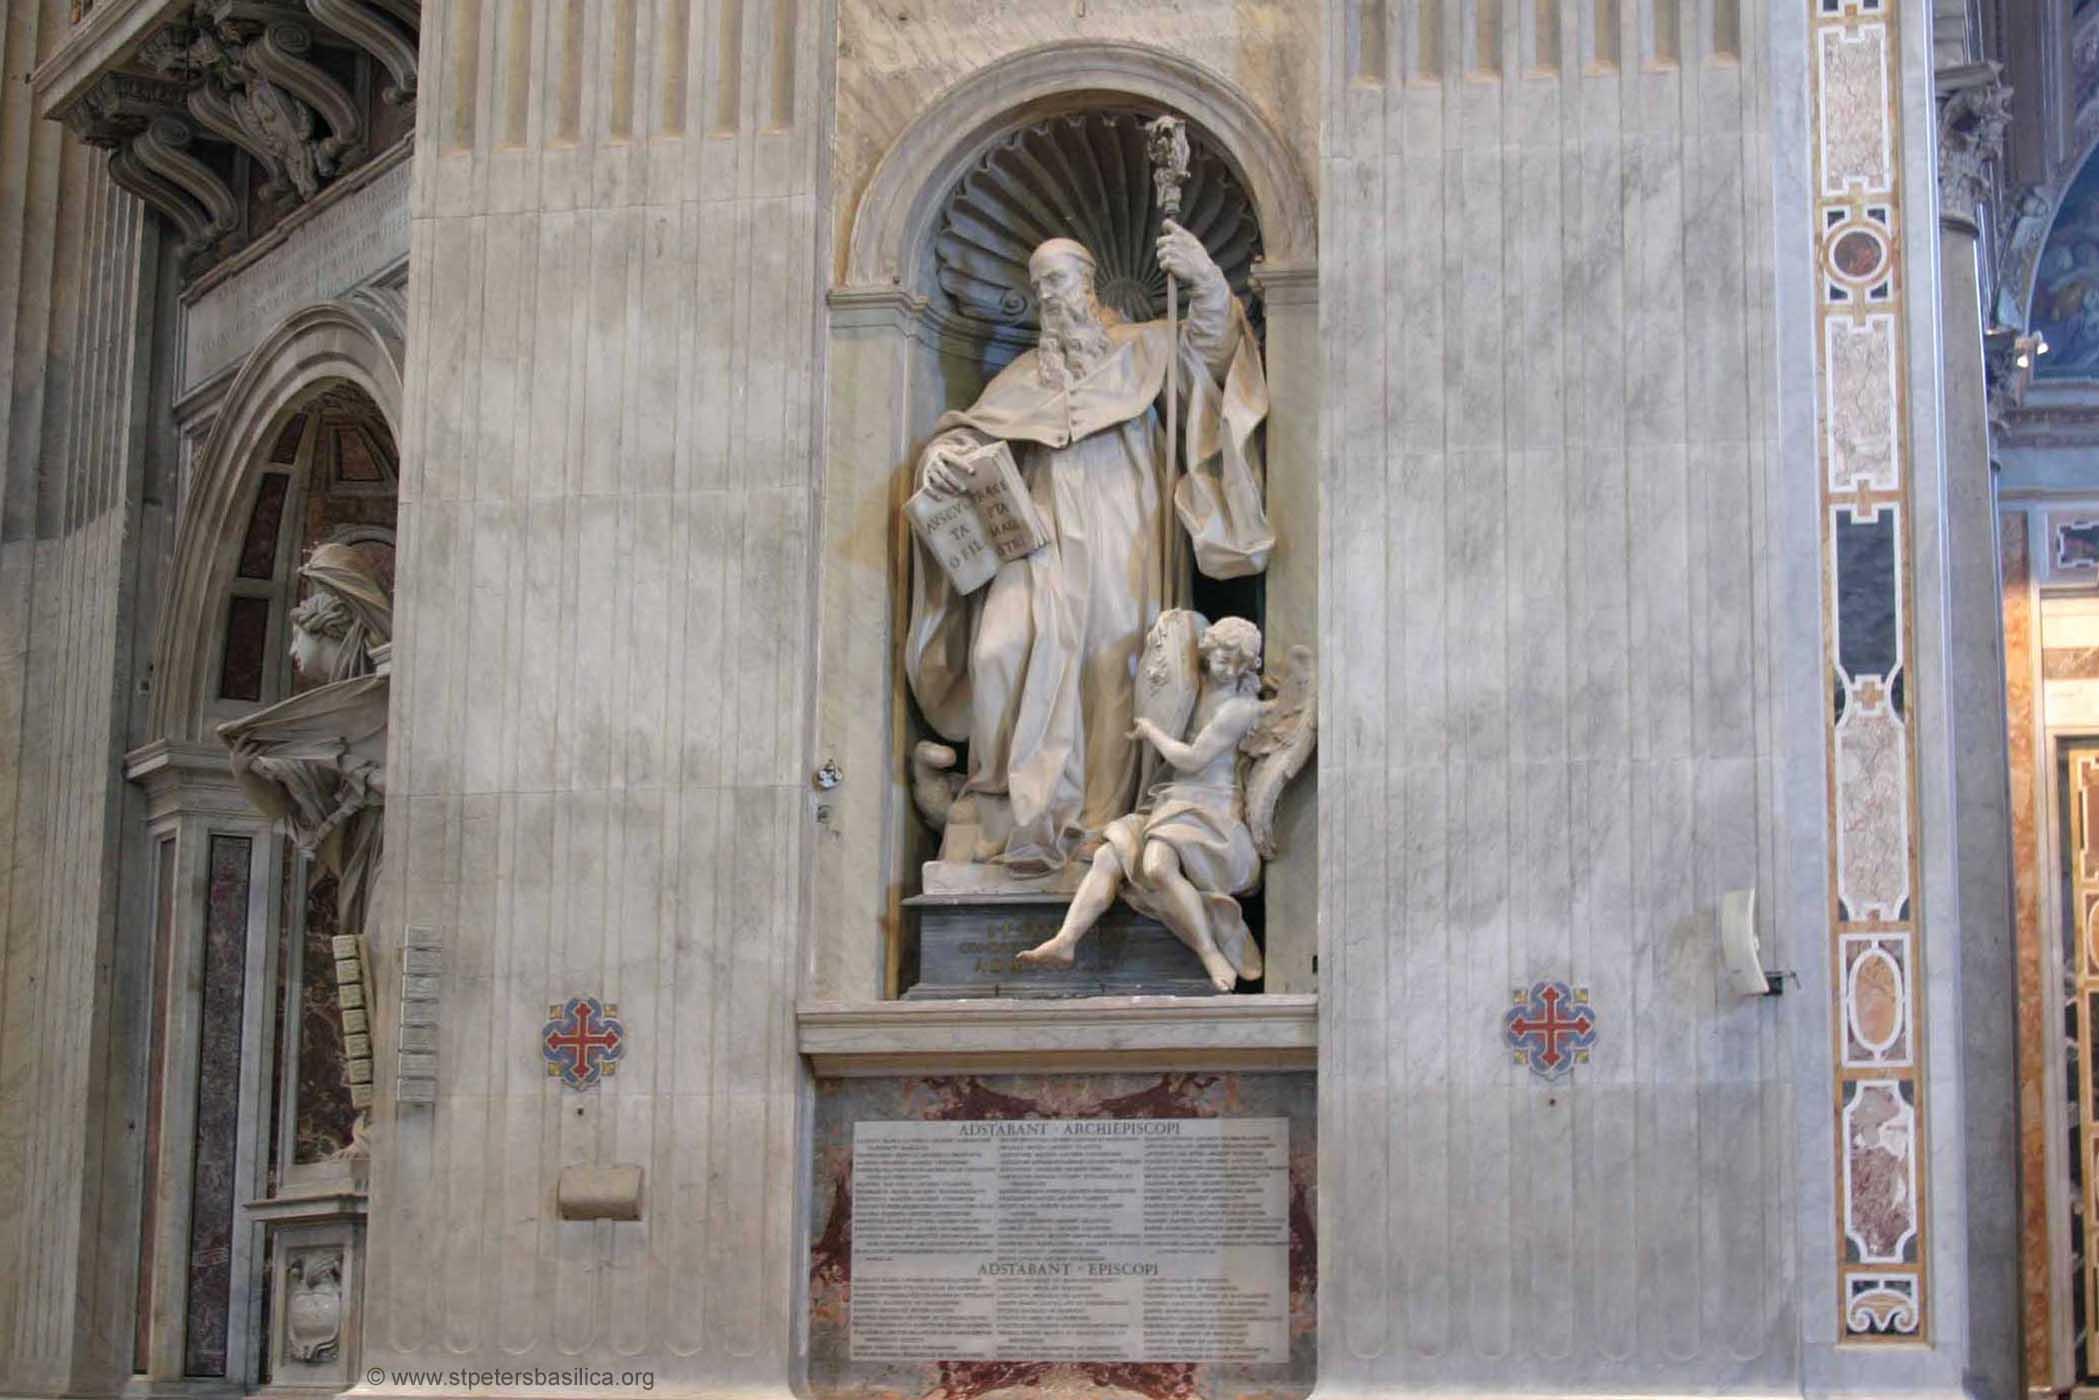 St Benedict Founder Statue